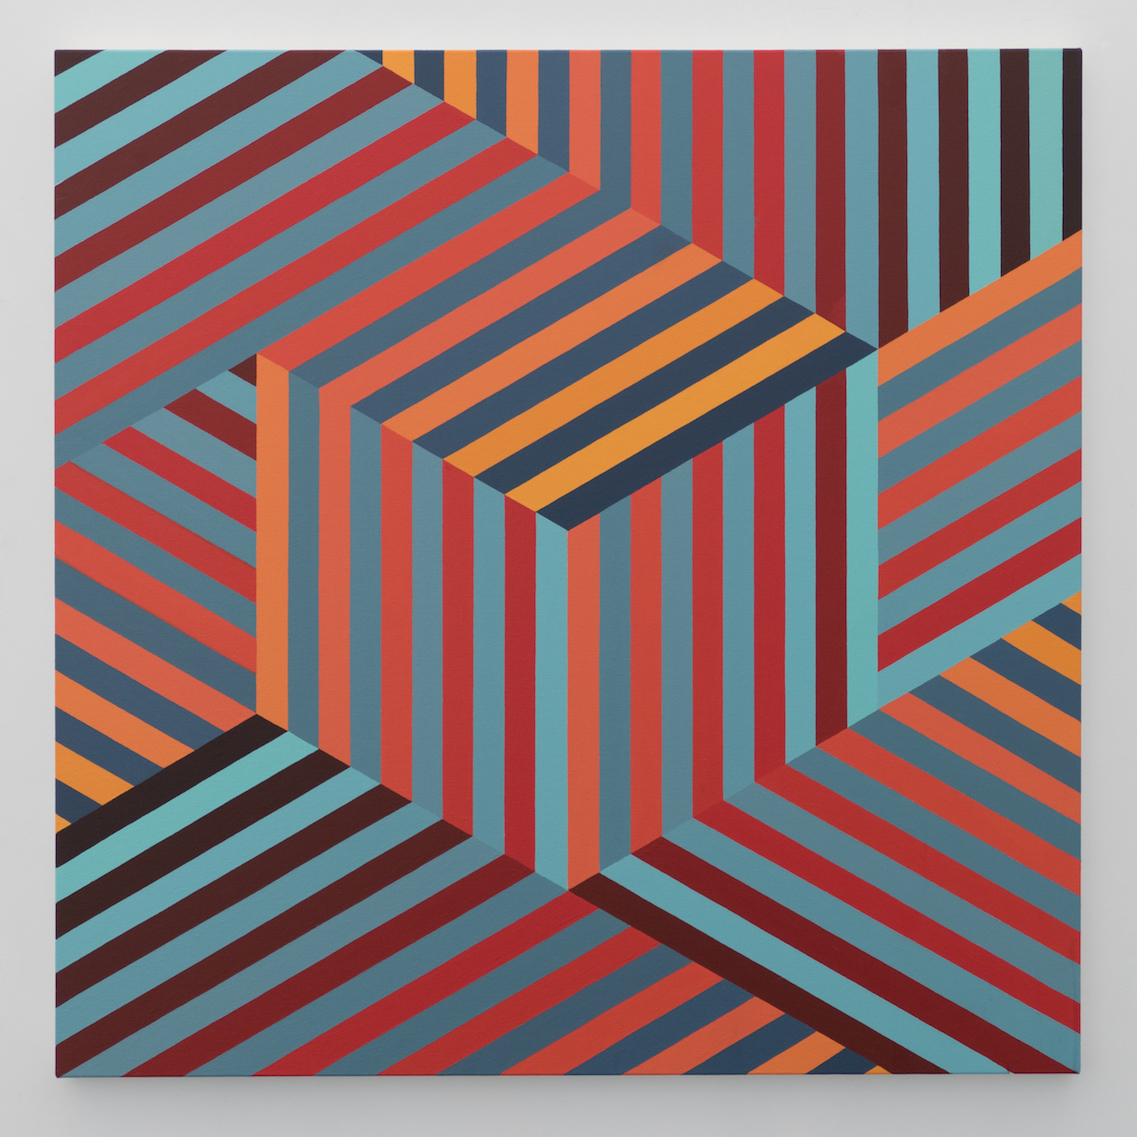 Tom Loveday Edge of Reality 1, 2018, Acrylic On Canvas 107 x 107 cm